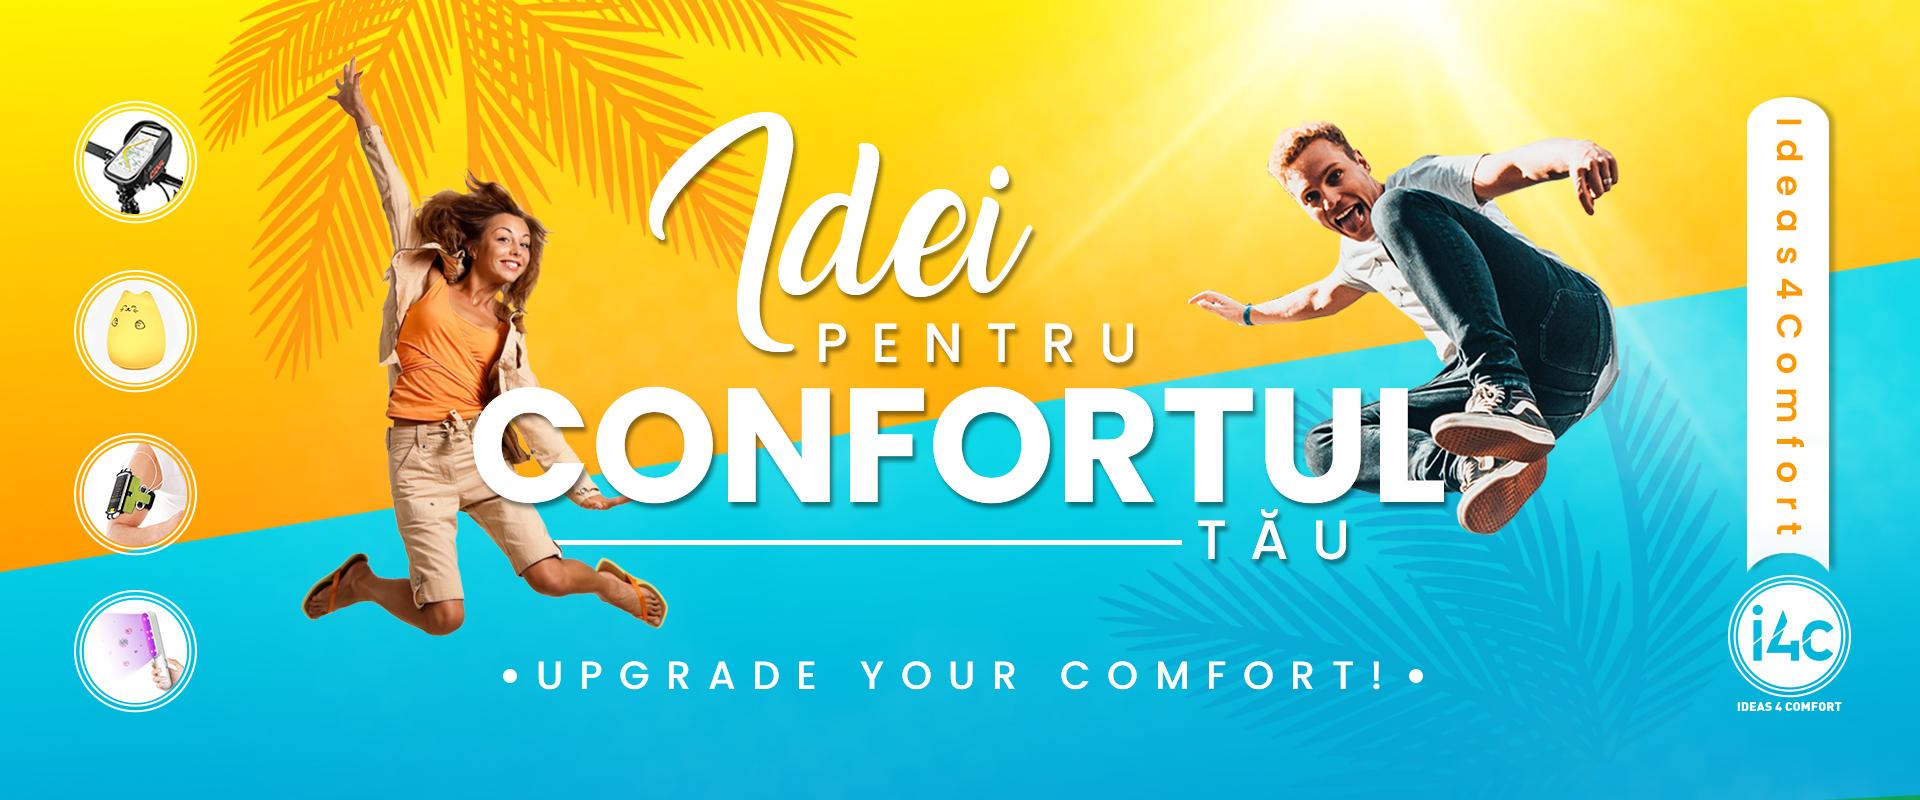 Upgrade your comfort